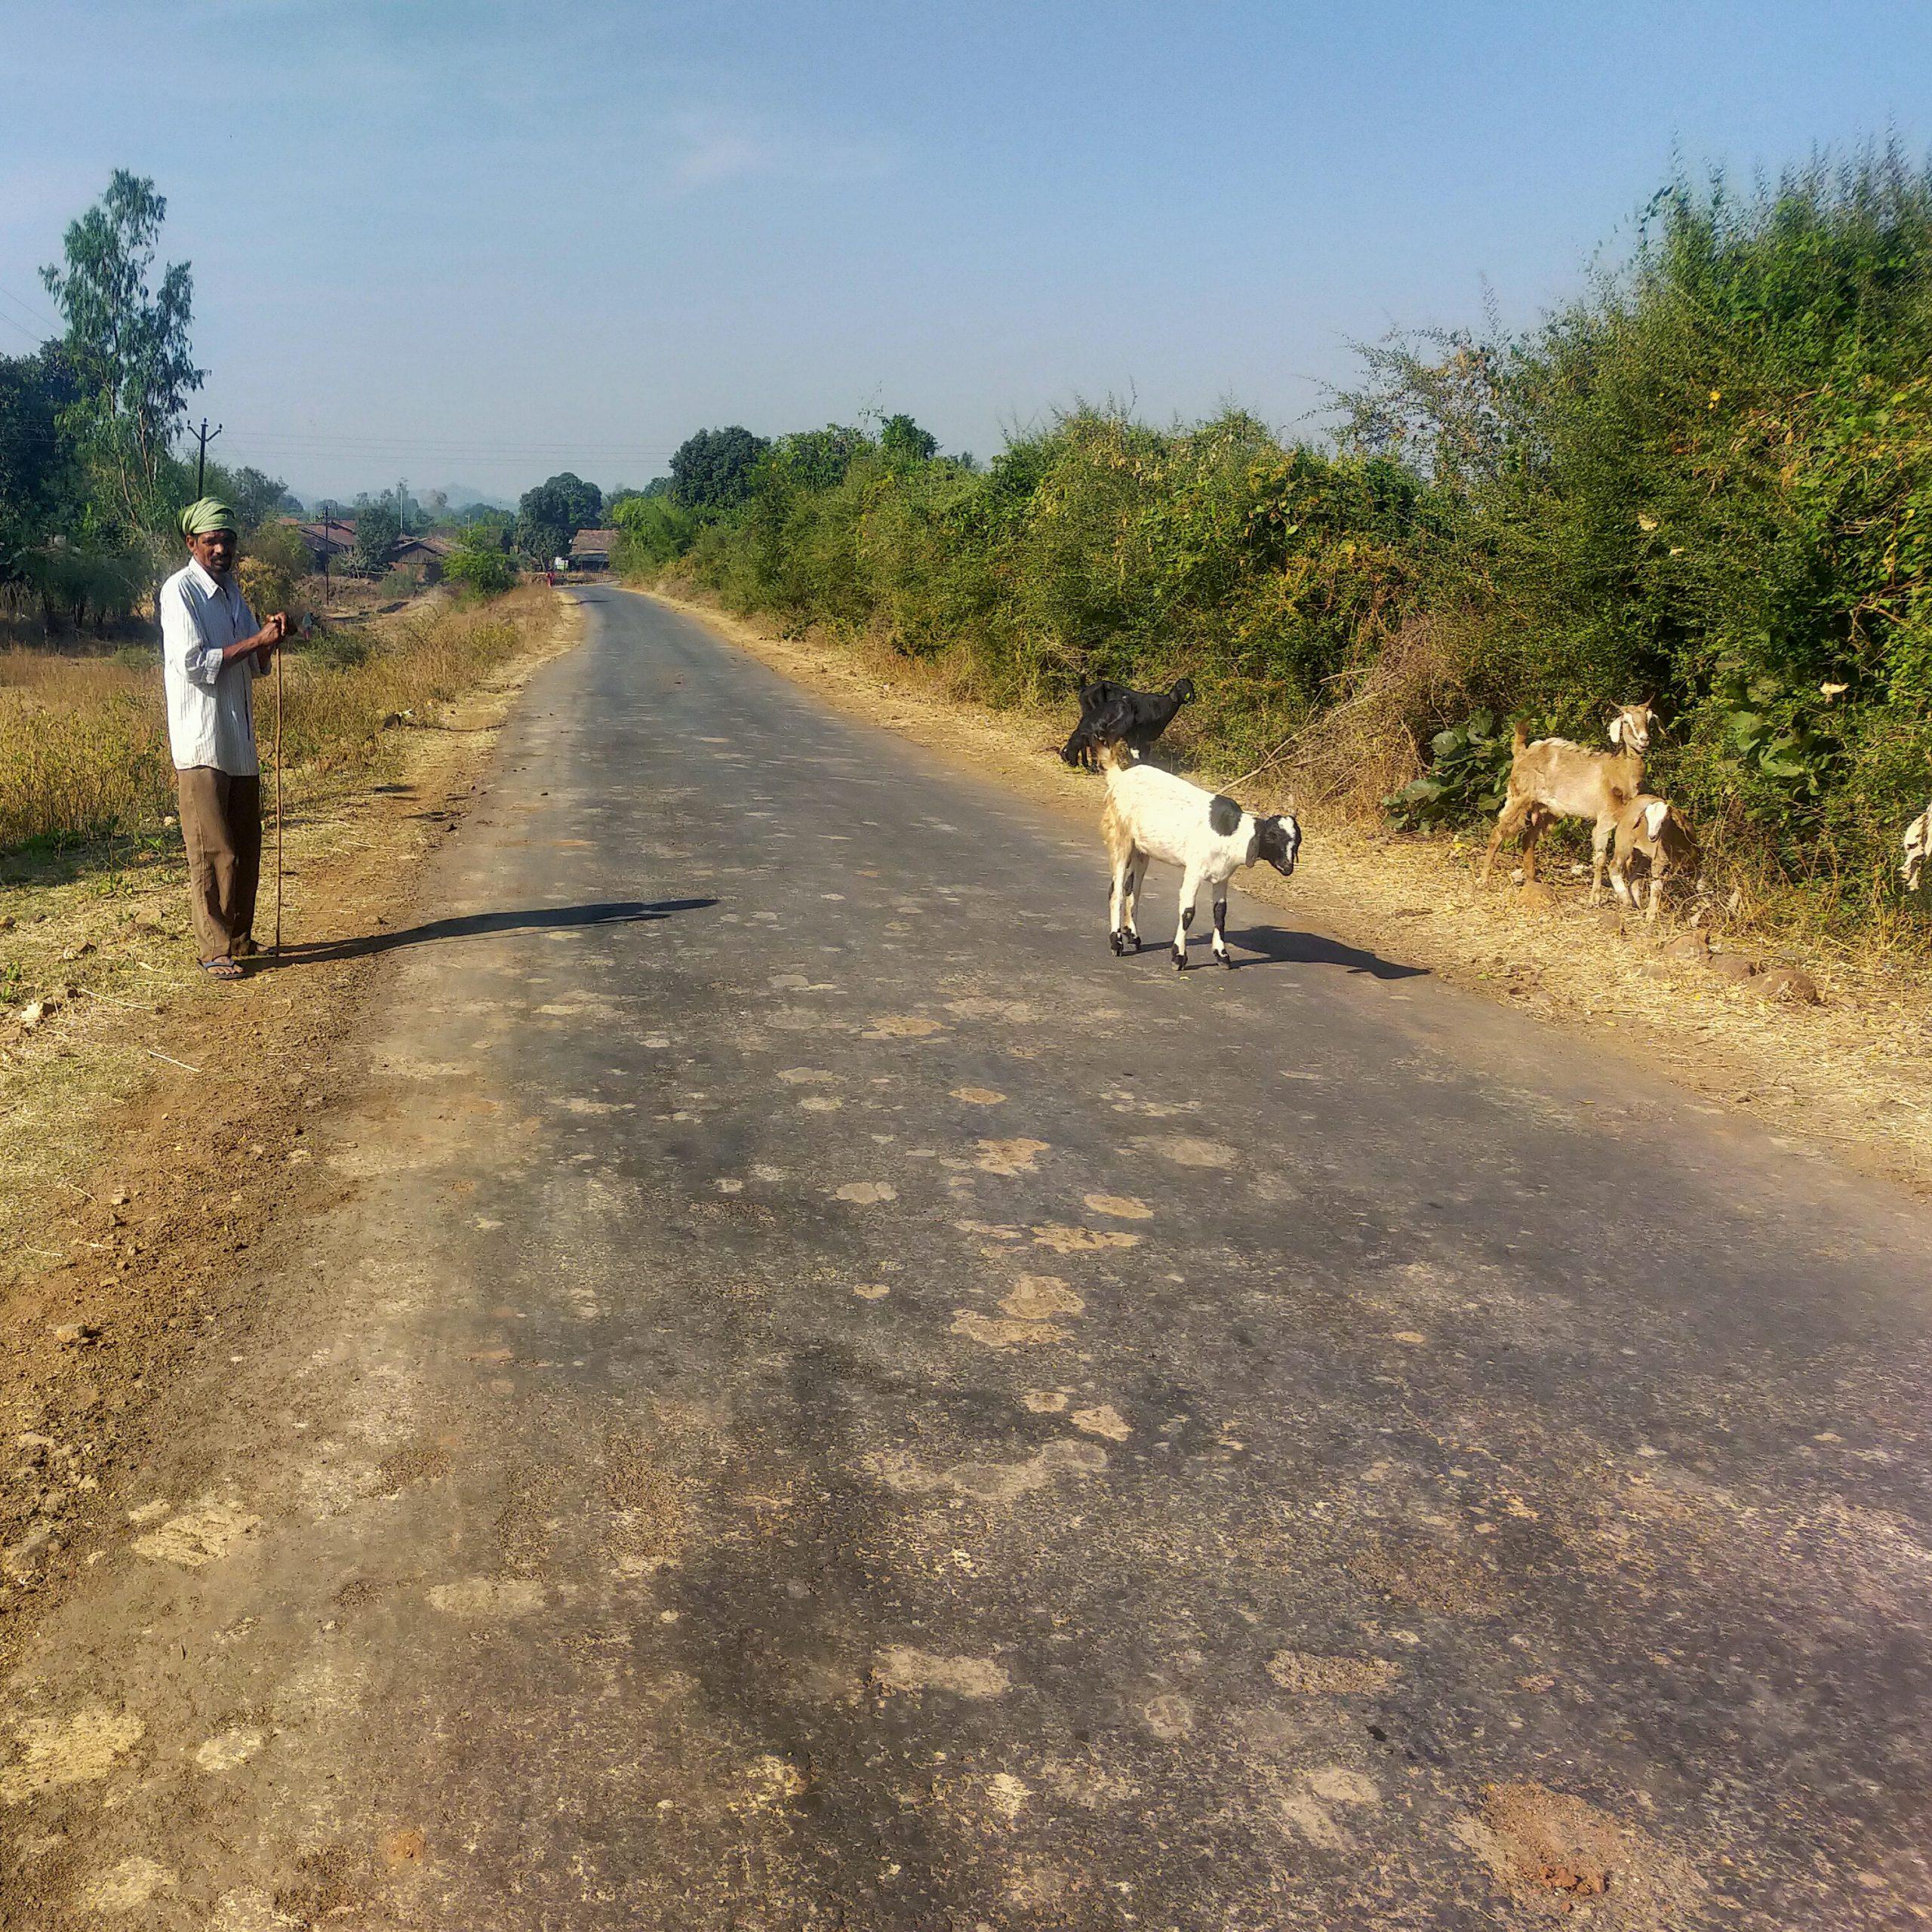 Man grazing goats roadside